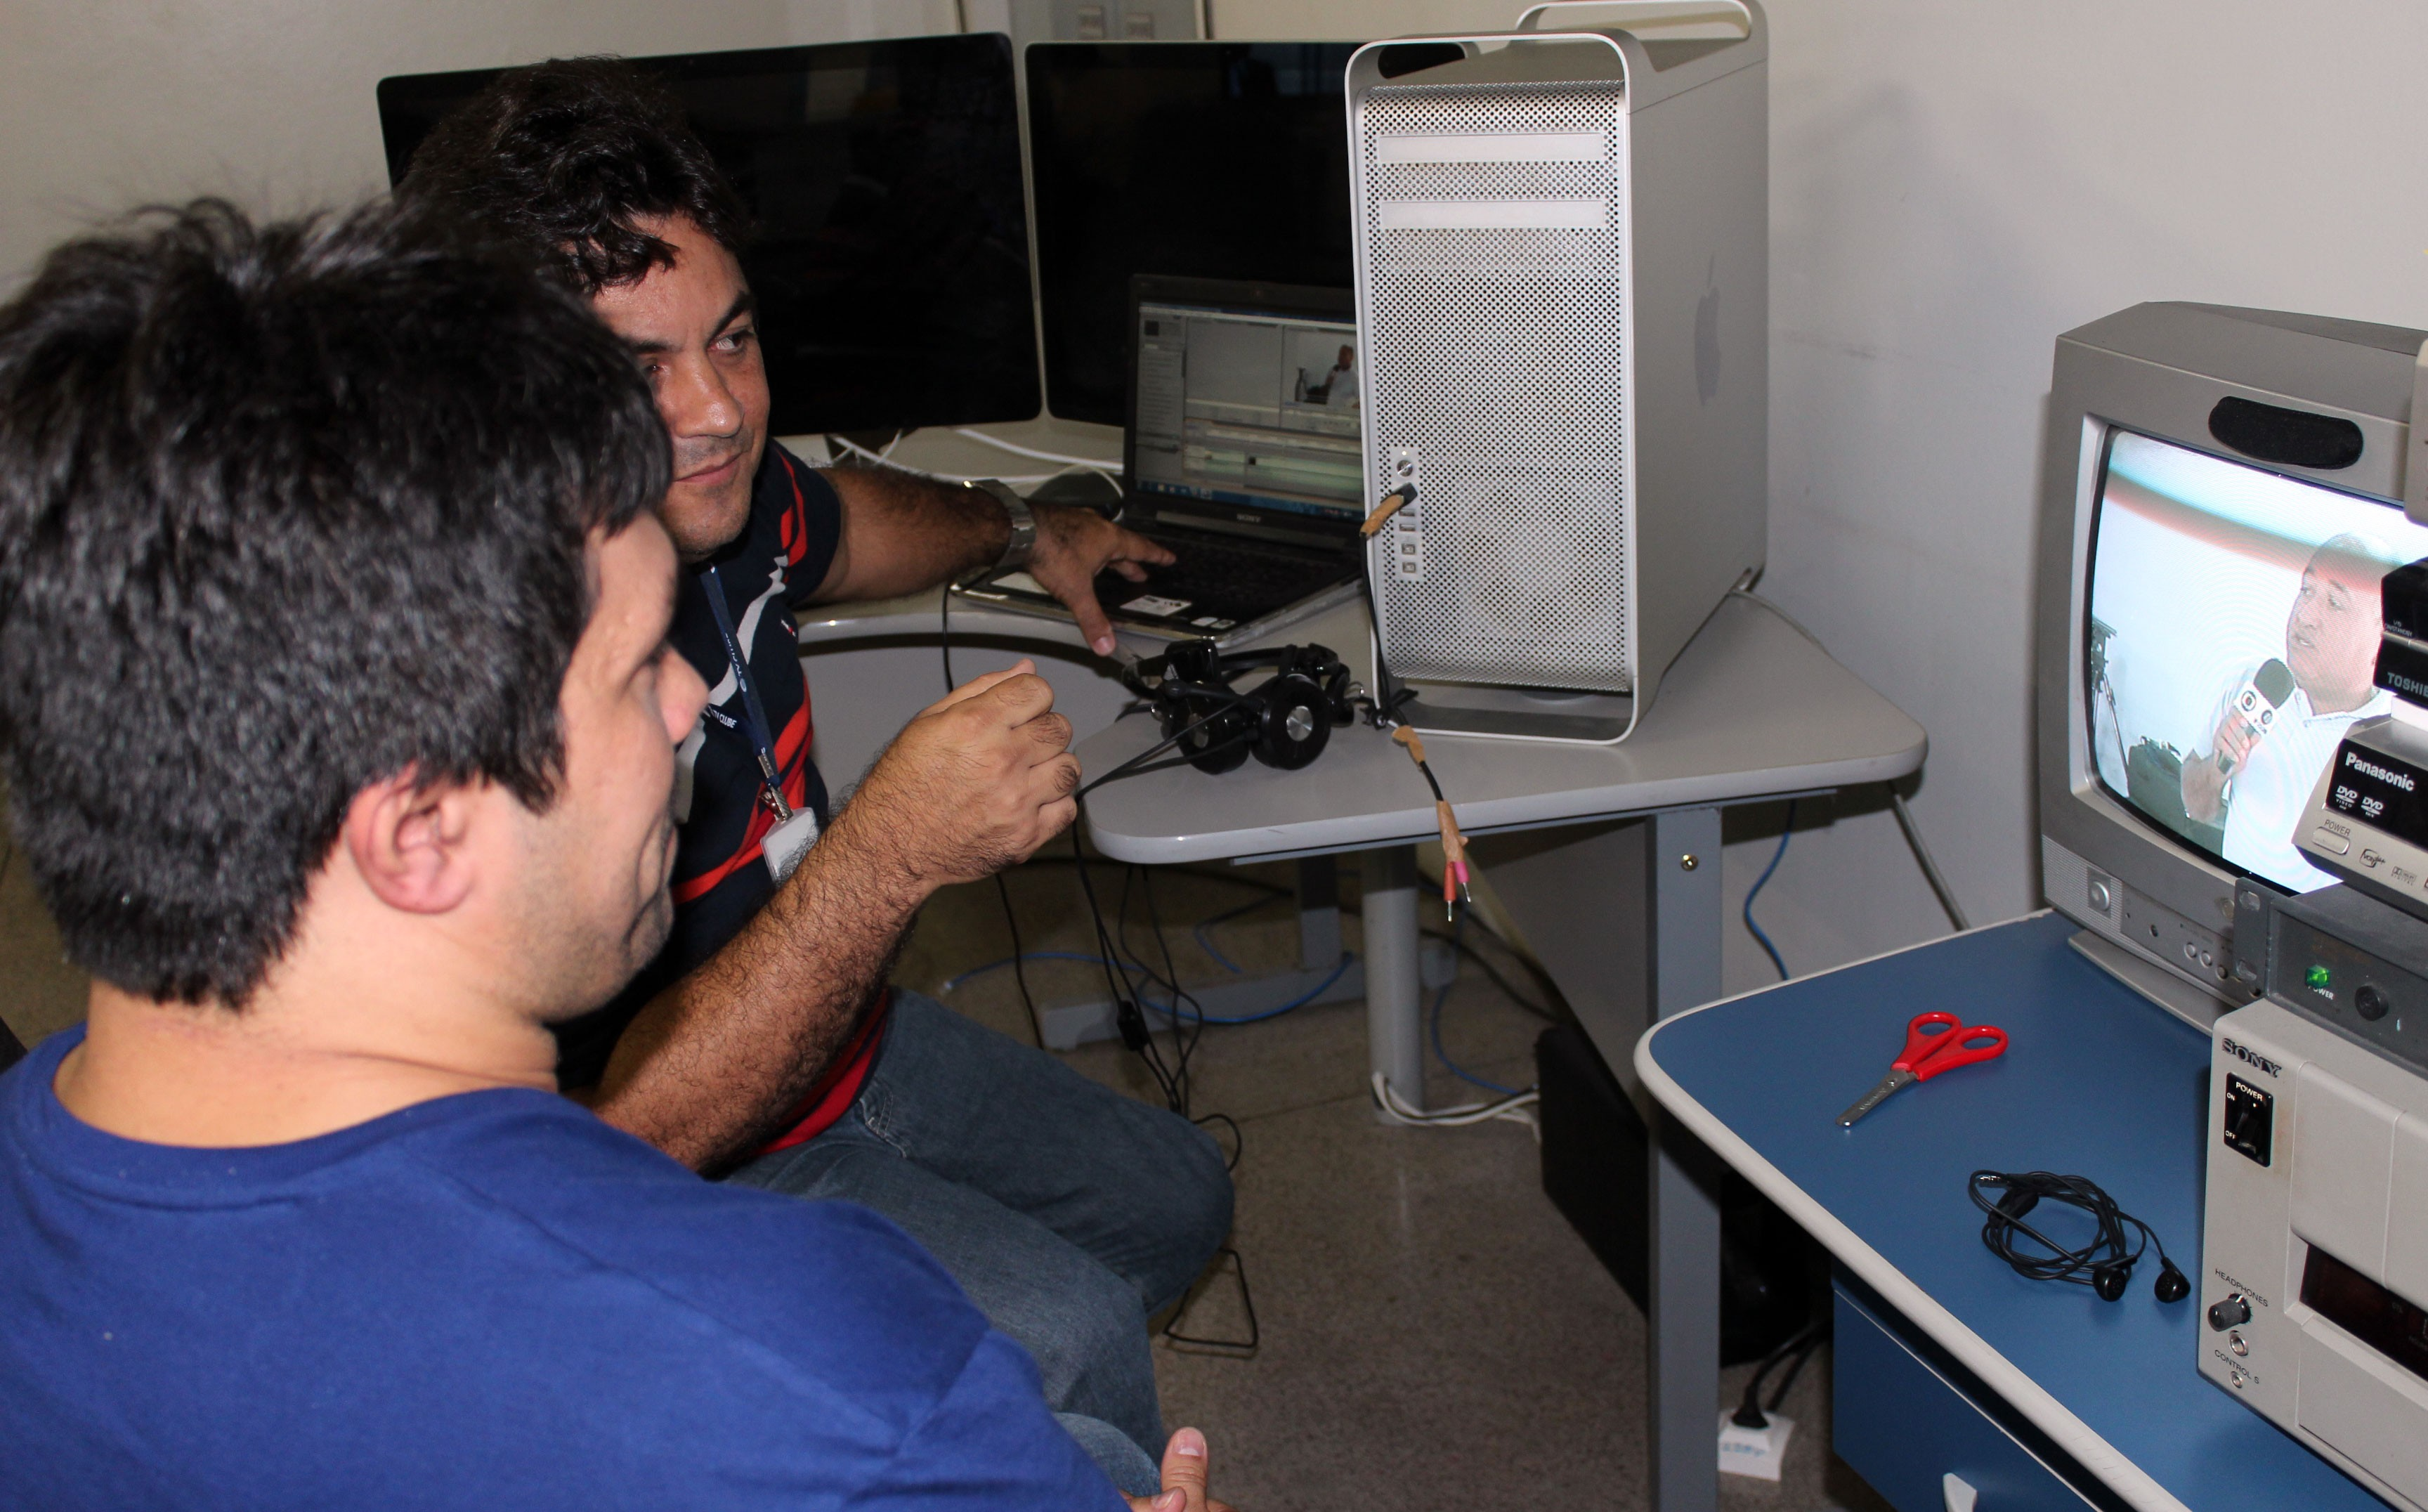 Magno Bonfim e Jucielo Freita analisam programas editados(Foto: Katylenin França)